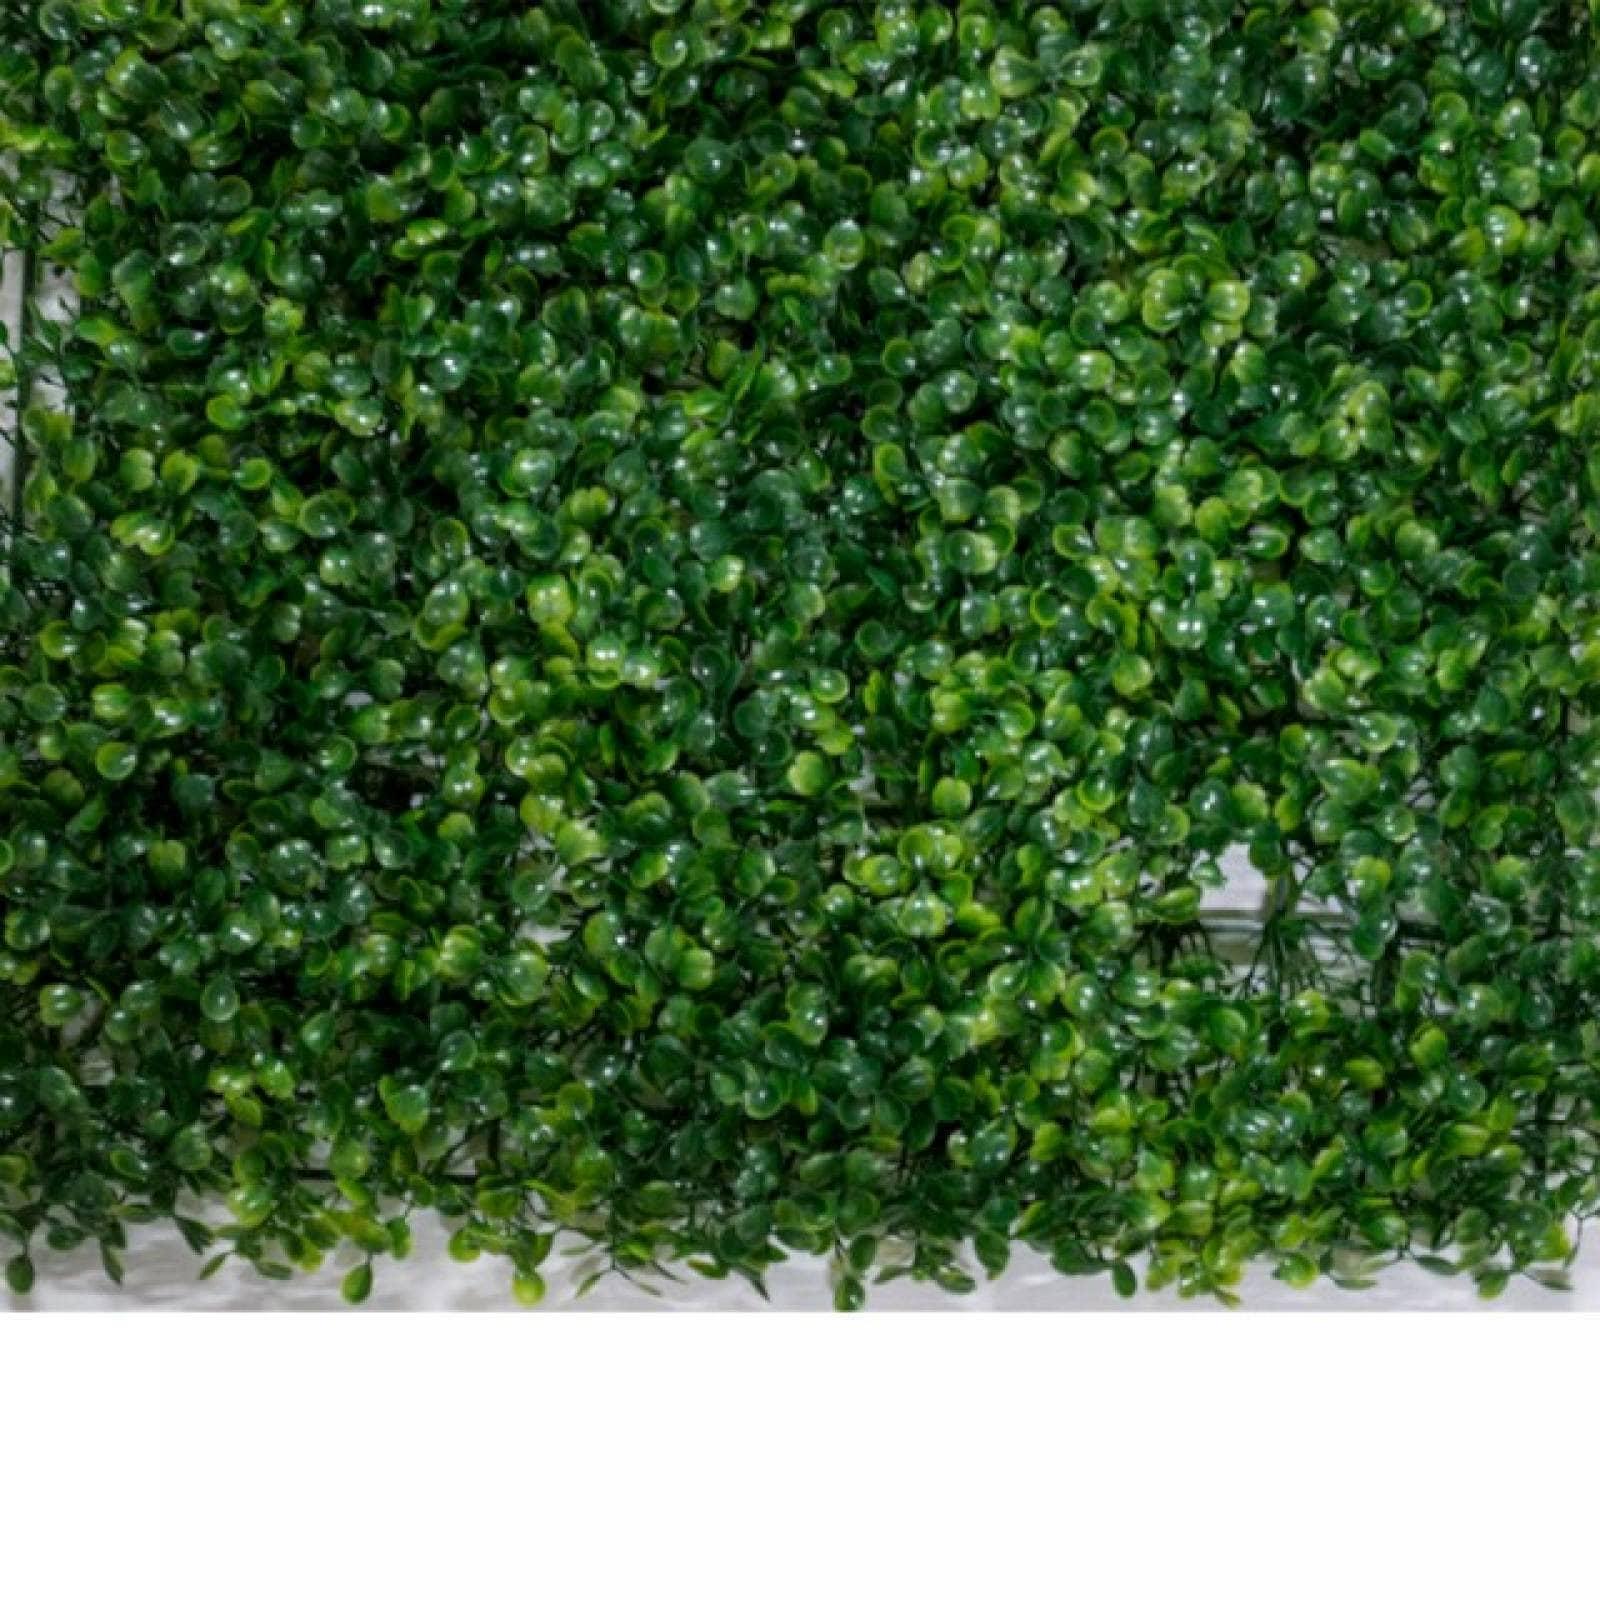 Follaje artificial 40x60 cm muro verde 10 piezas modelo jardín